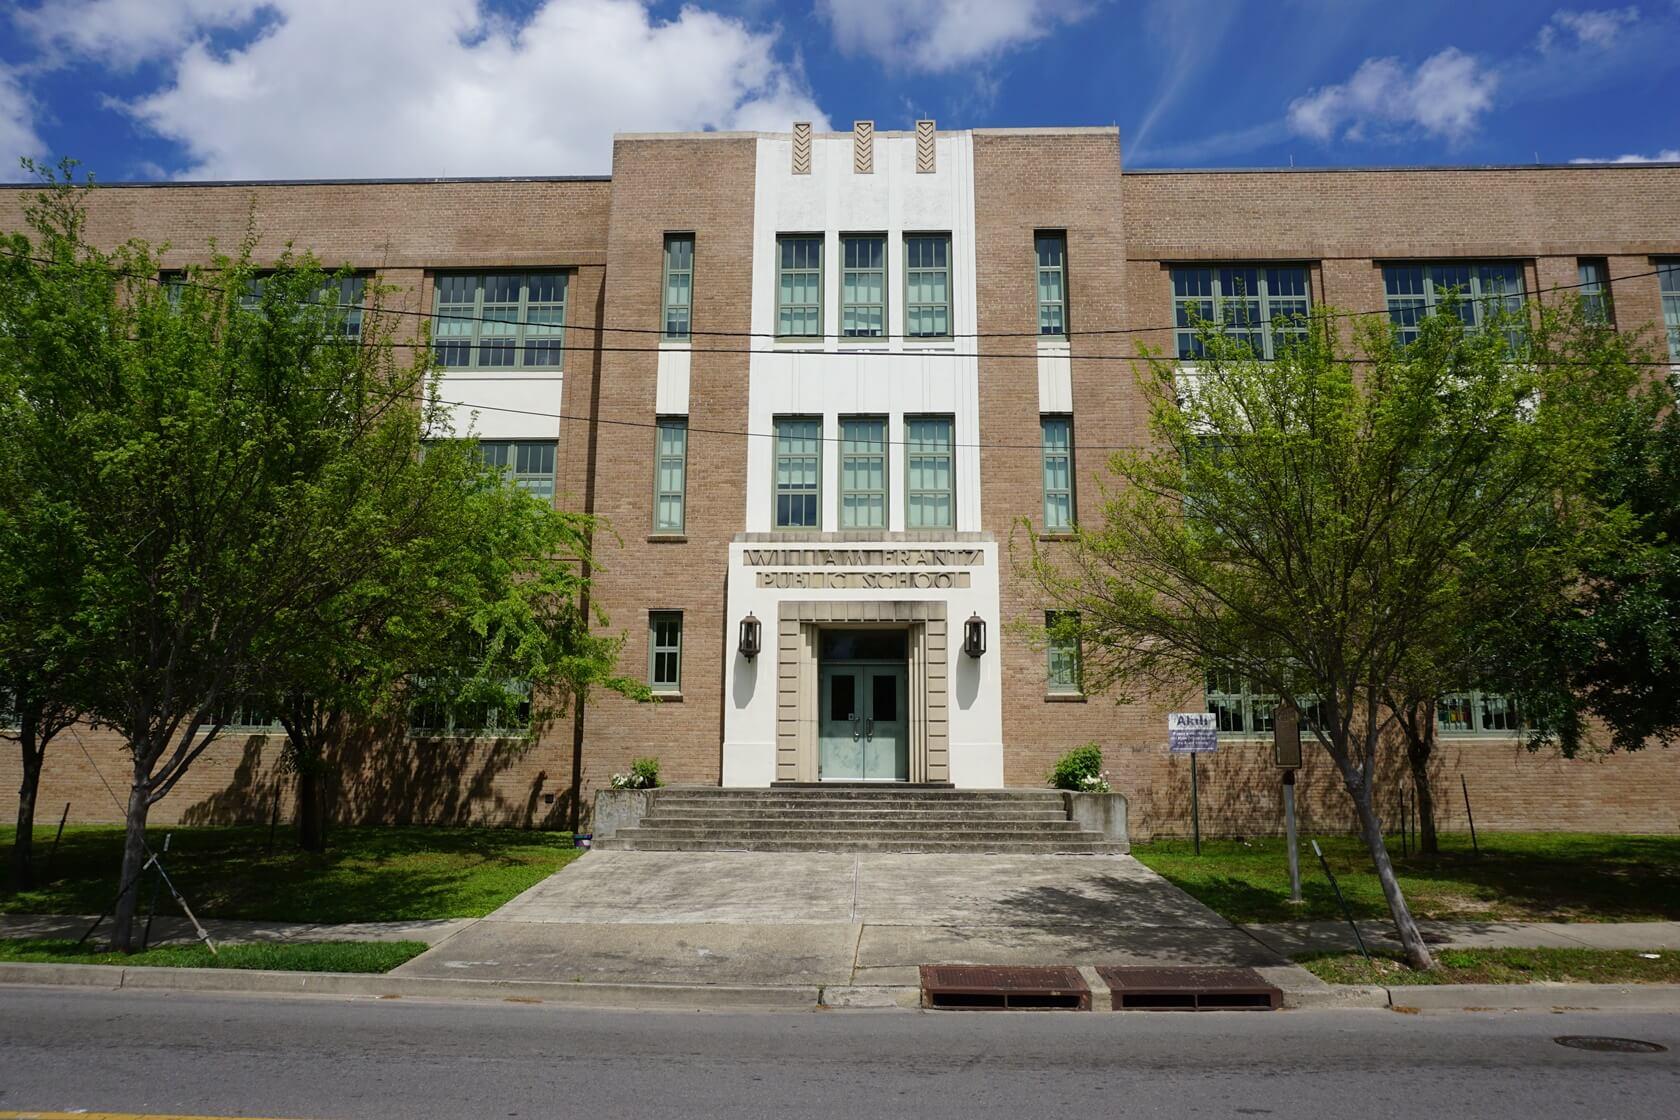 The entrance to William Frantz Elementary School